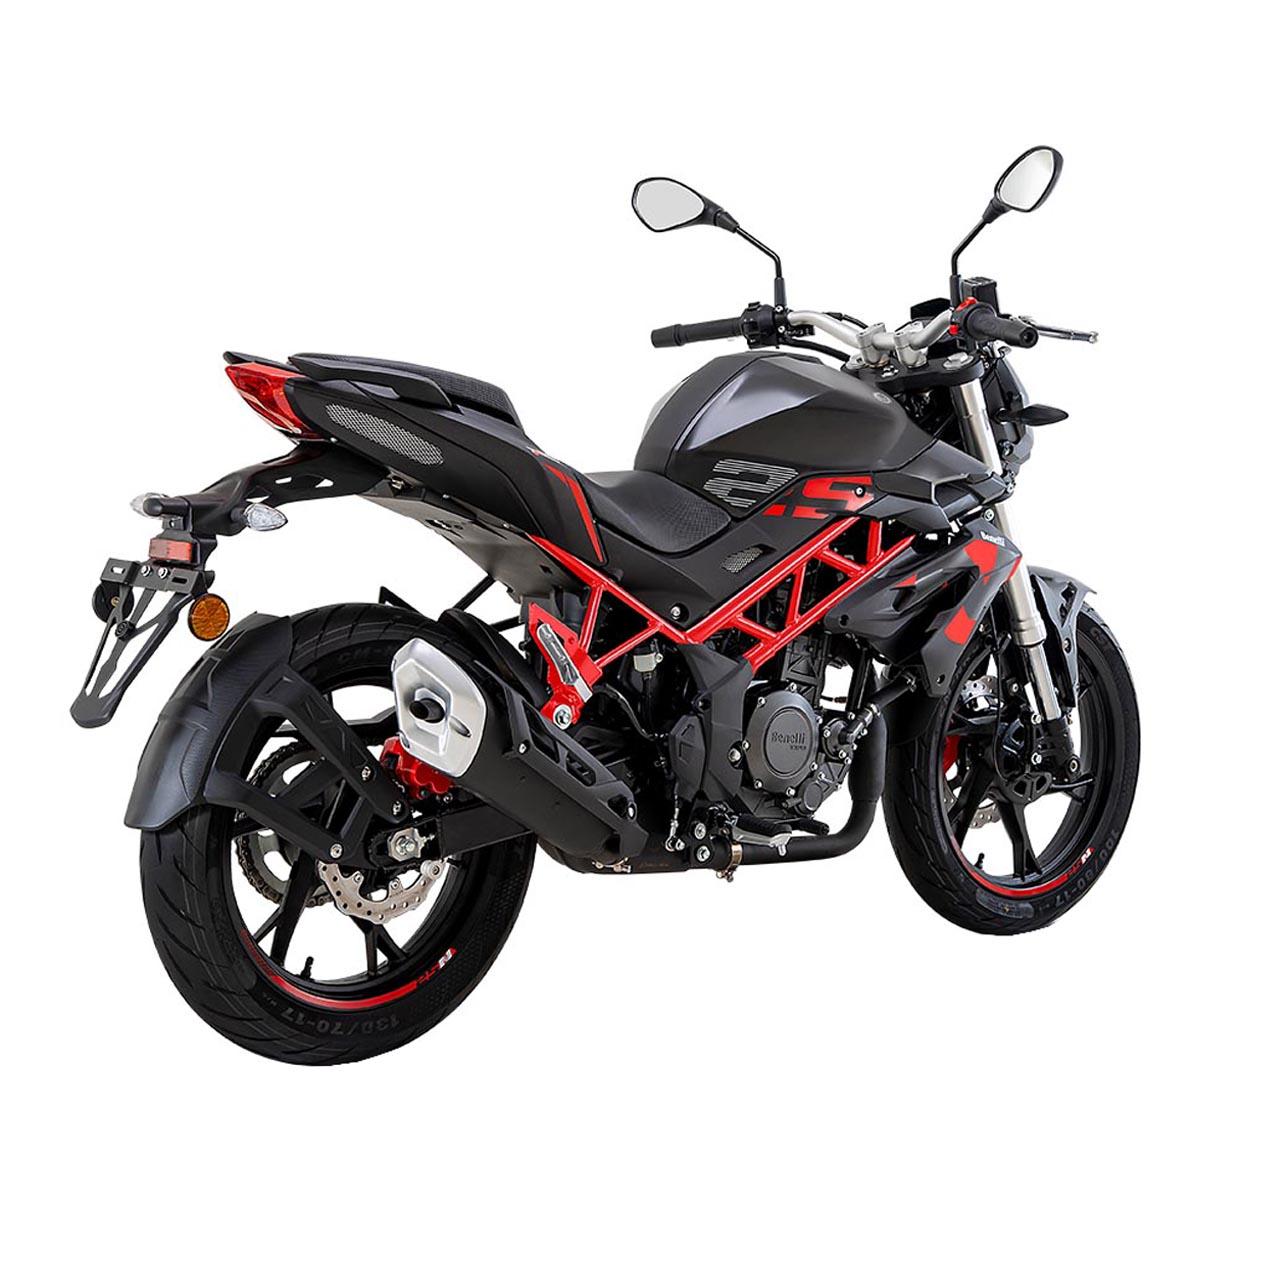 موتورسیکلت بنلی مدل TNT25N سال 1399 main 1 3